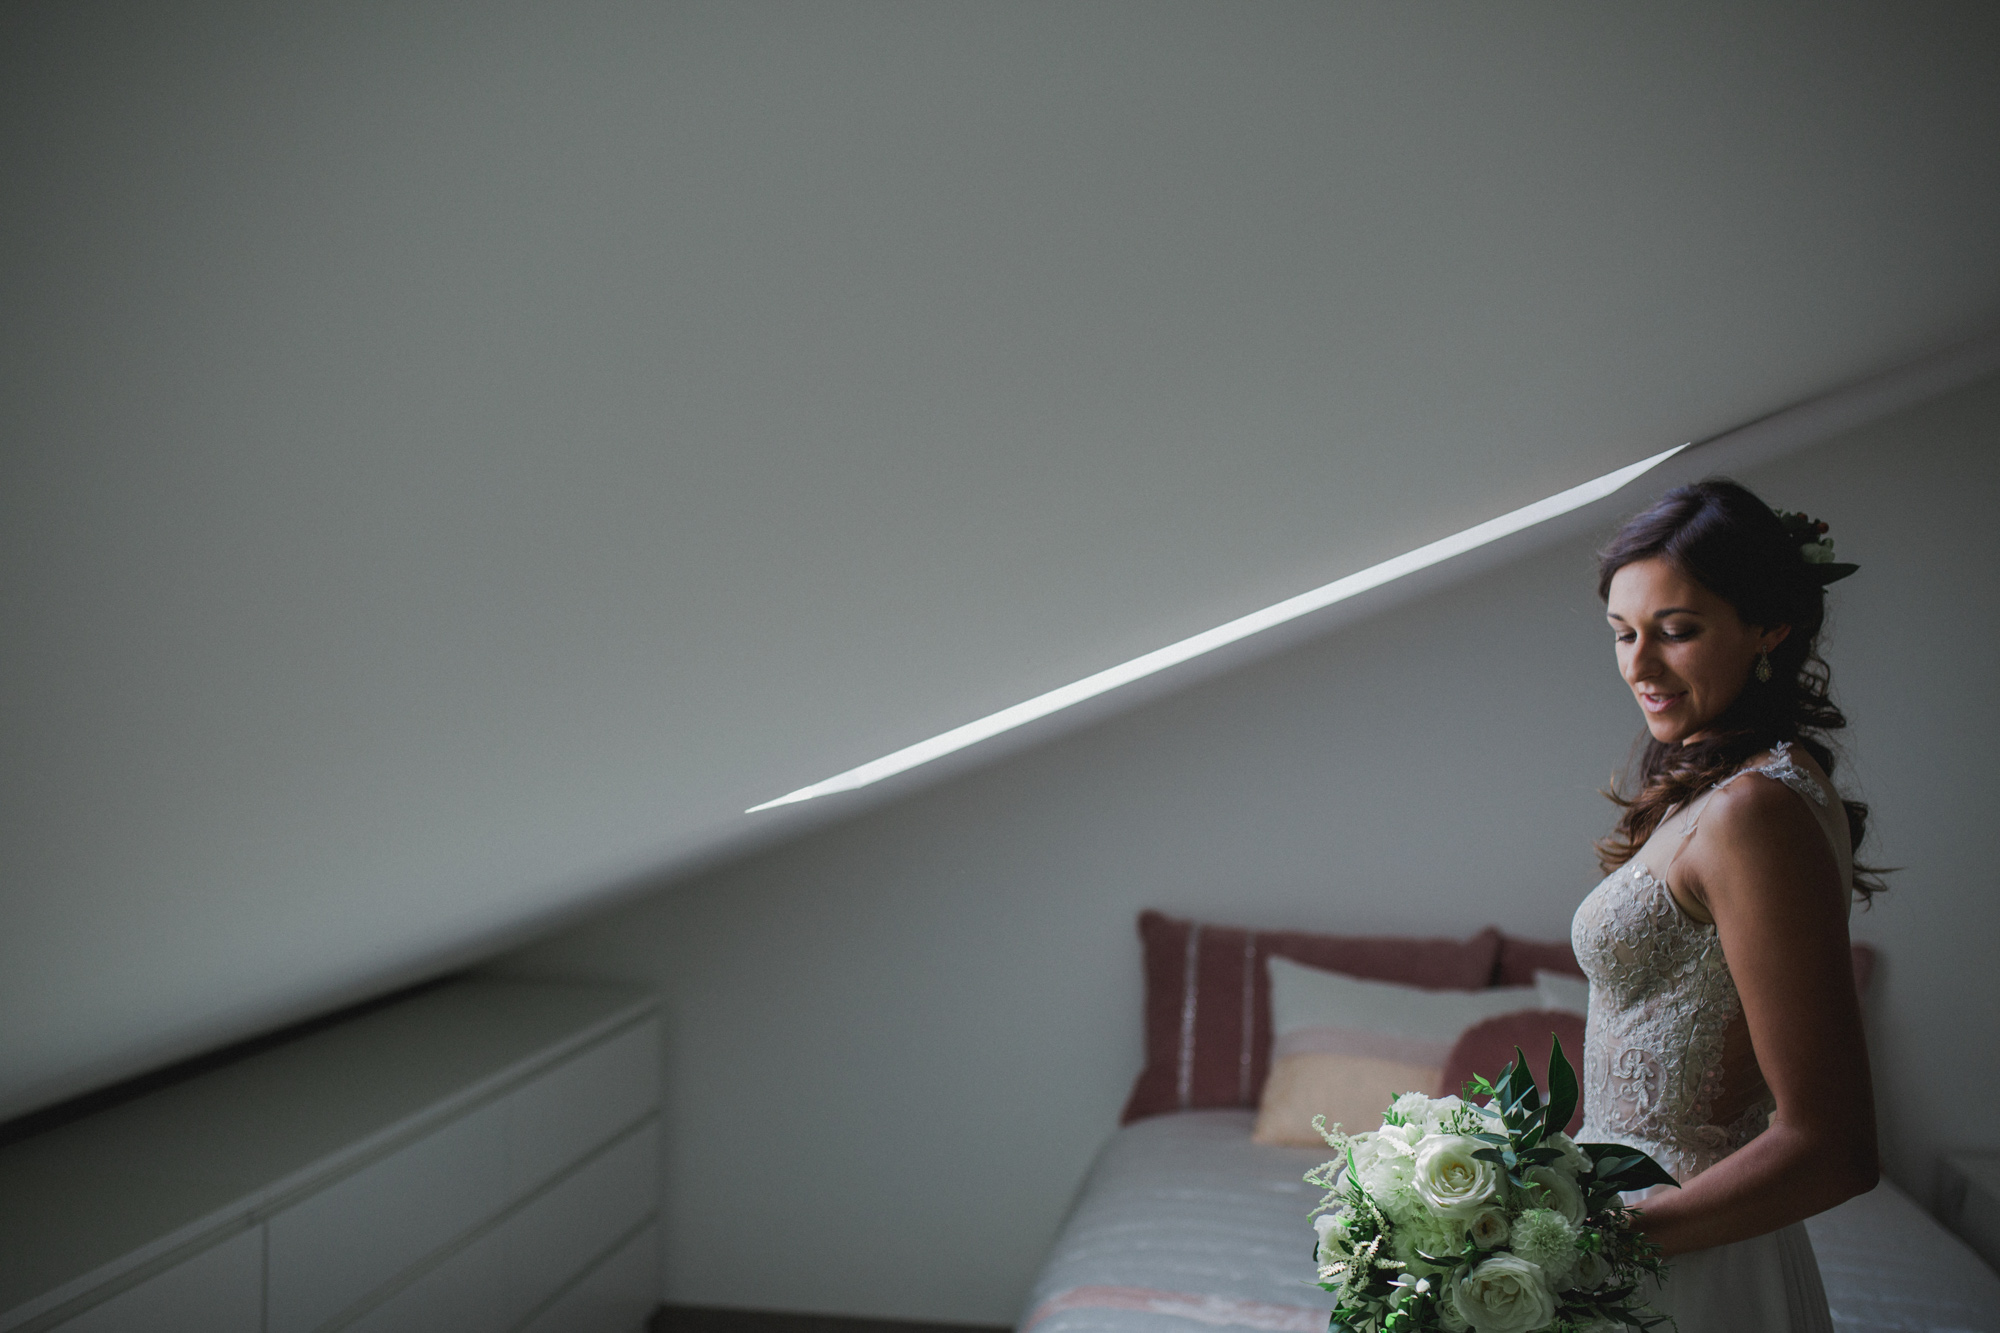 075-carina-e-samuel-wedding-casamento-quinta-dos-rouxinois-rustico-my-fancy-wedding-mafra-malveira-lisboa-sintra-cascais-filipe-santiago-fotografia-fotografo-lifestyle-destination-portugal